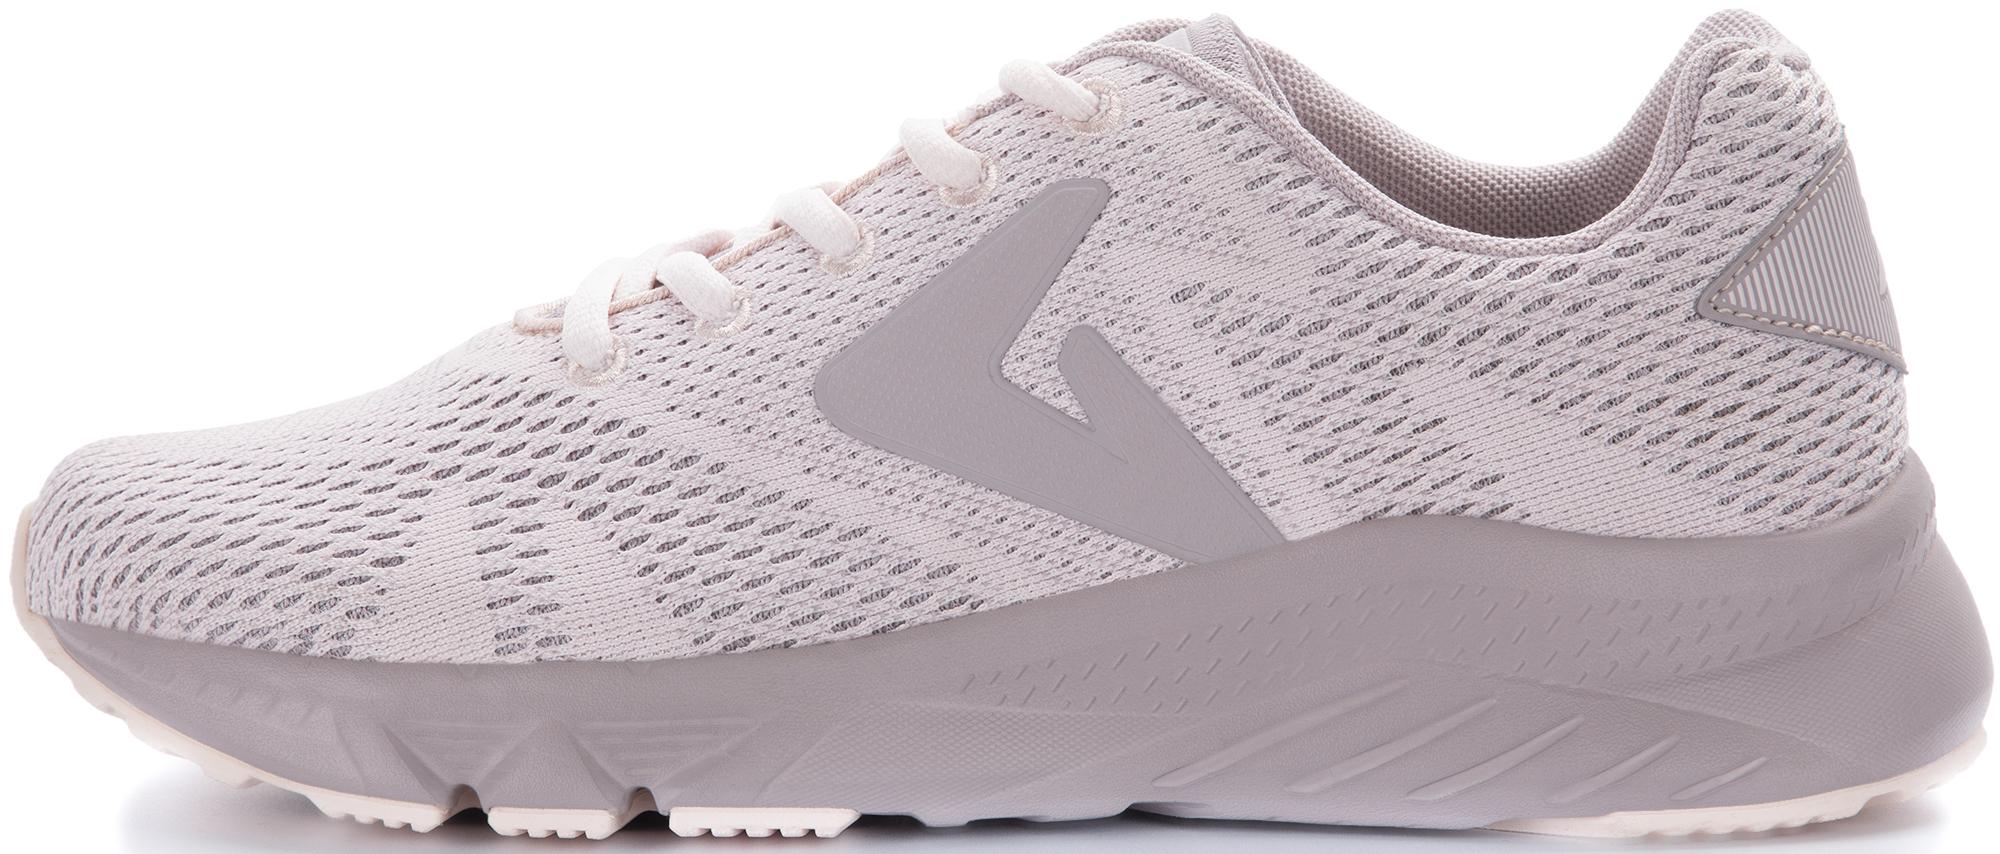 Demix Кроссовки женские Demix X-Trainer II, размер 37 demix кроссовки для девочек demix x trainer размер 39